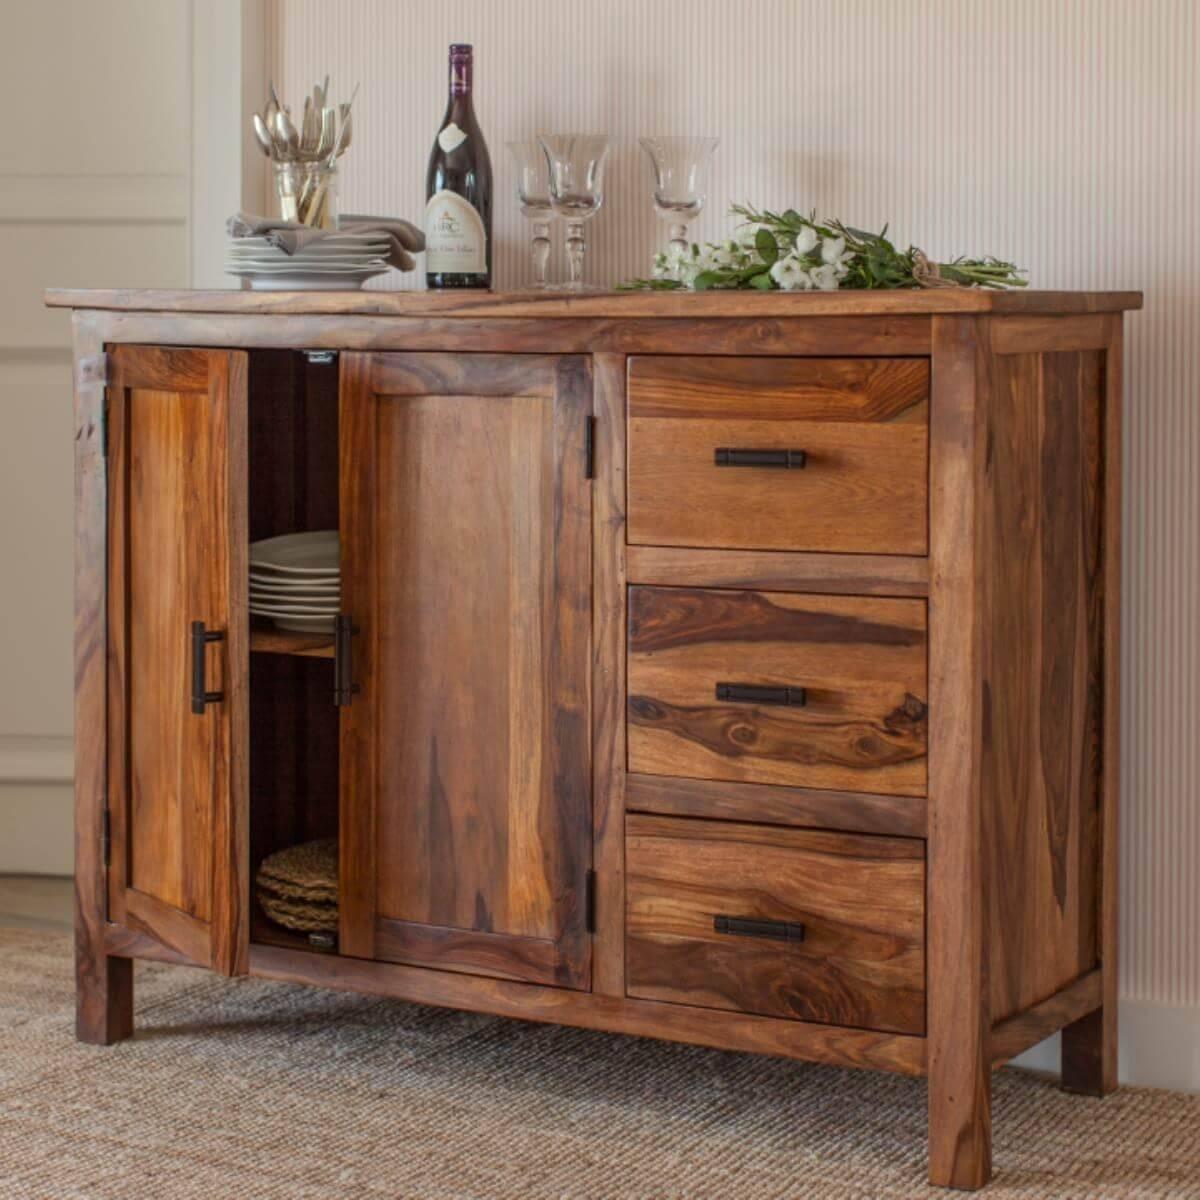 Sheesham Sideboard Units – The Furniture Co In Sheesham Sideboards (View 13 of 20)